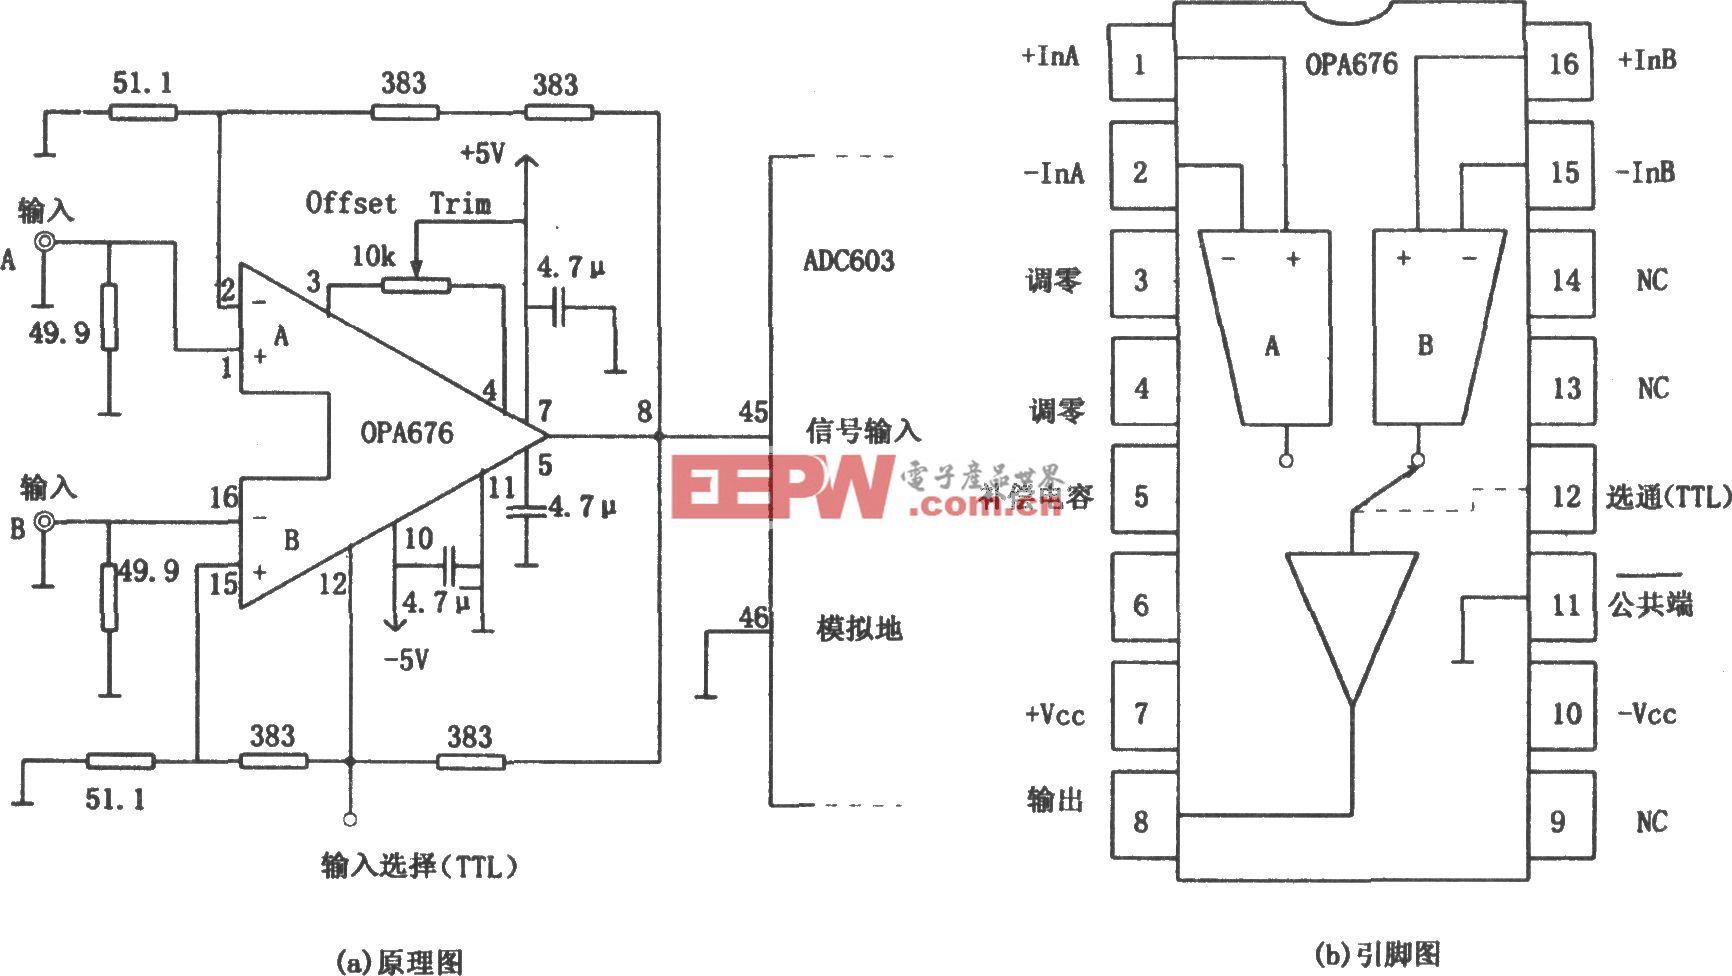 OPA676构成的24dB两路传输缓冲放大器